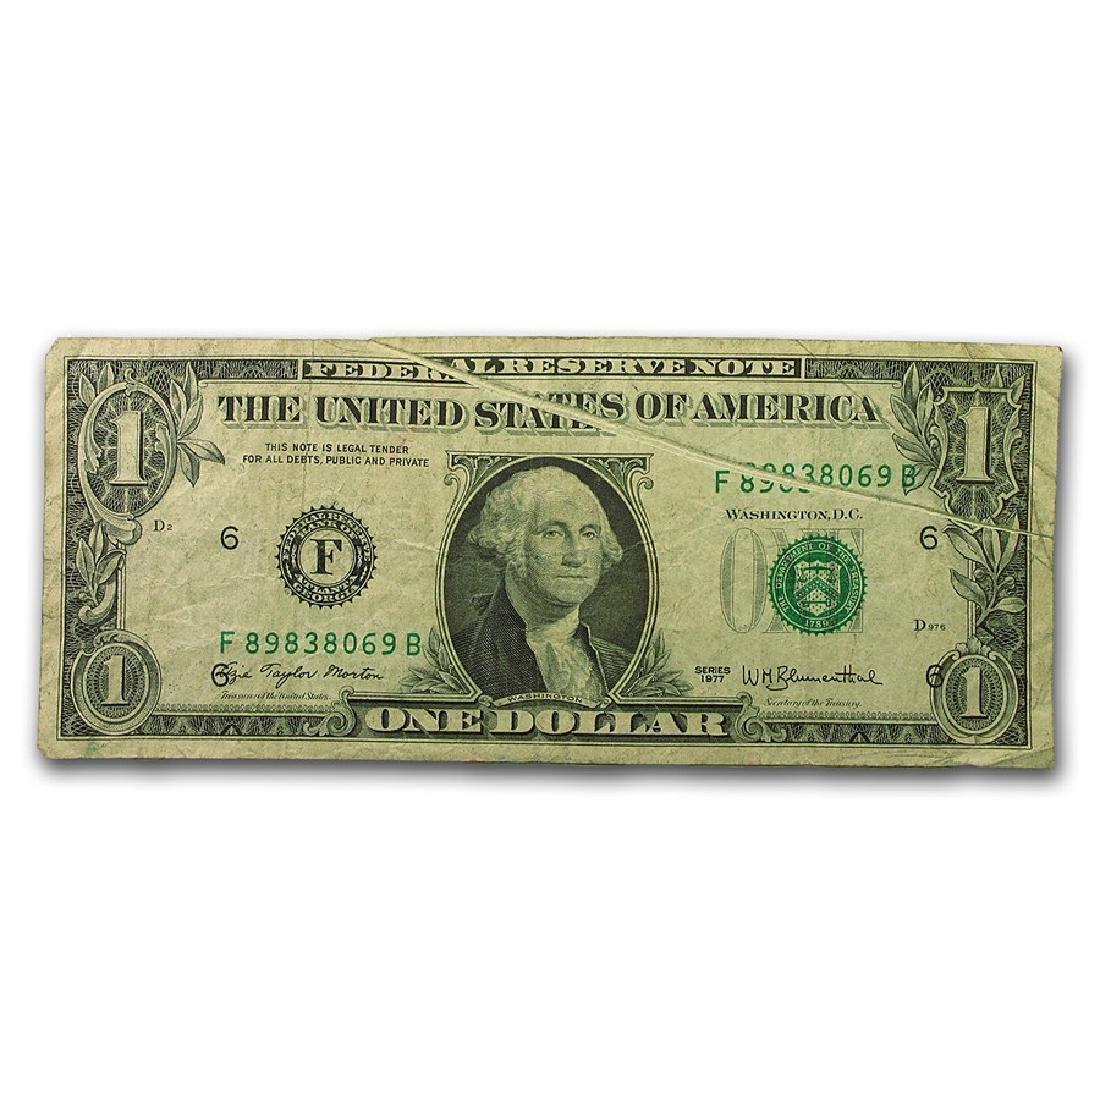 1977 $1 Gutter Fold Error Atlanta Federal Reserve Note